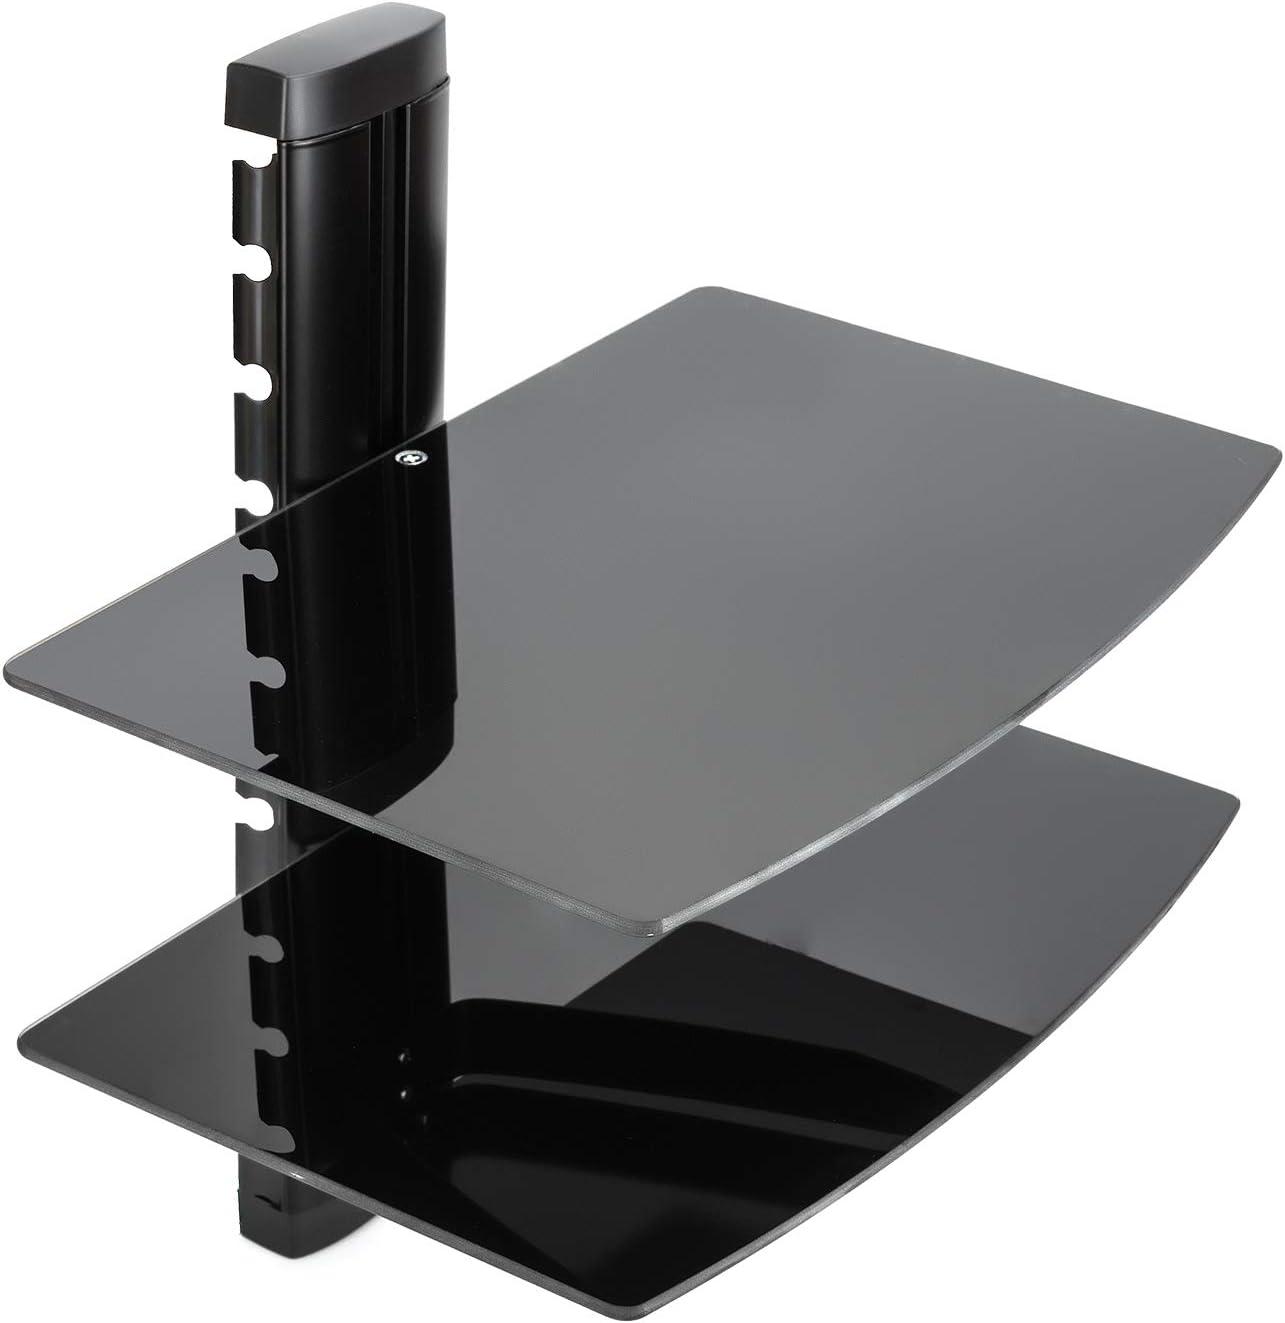 Vemount Wandregal Tv Rack Wandhalterung Dvd Design Amazon De